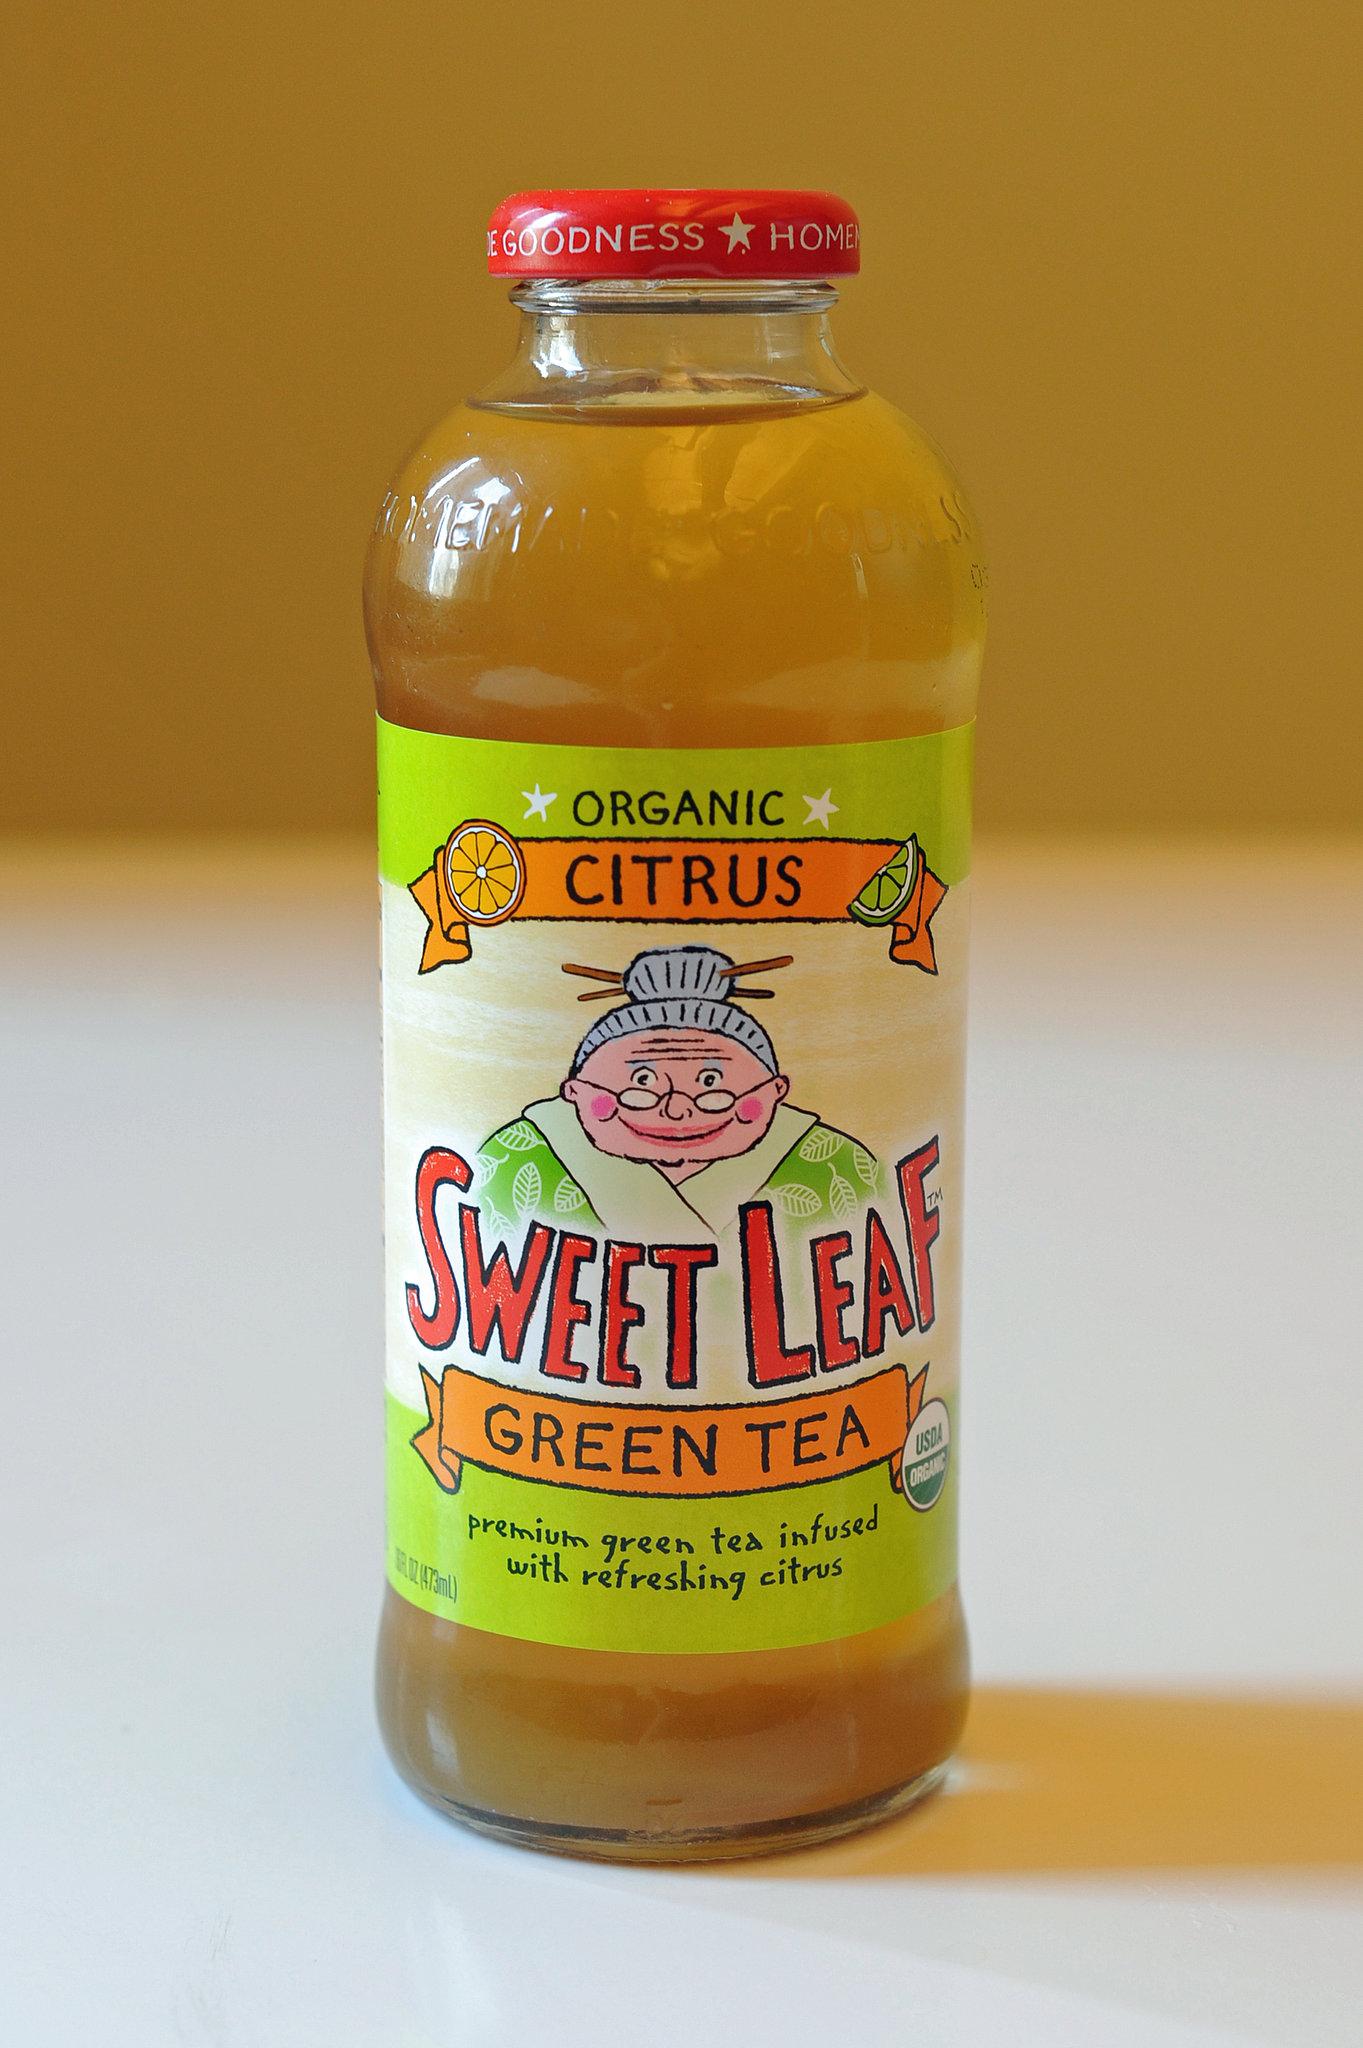 Sweet Leaf Citrus Green Tea